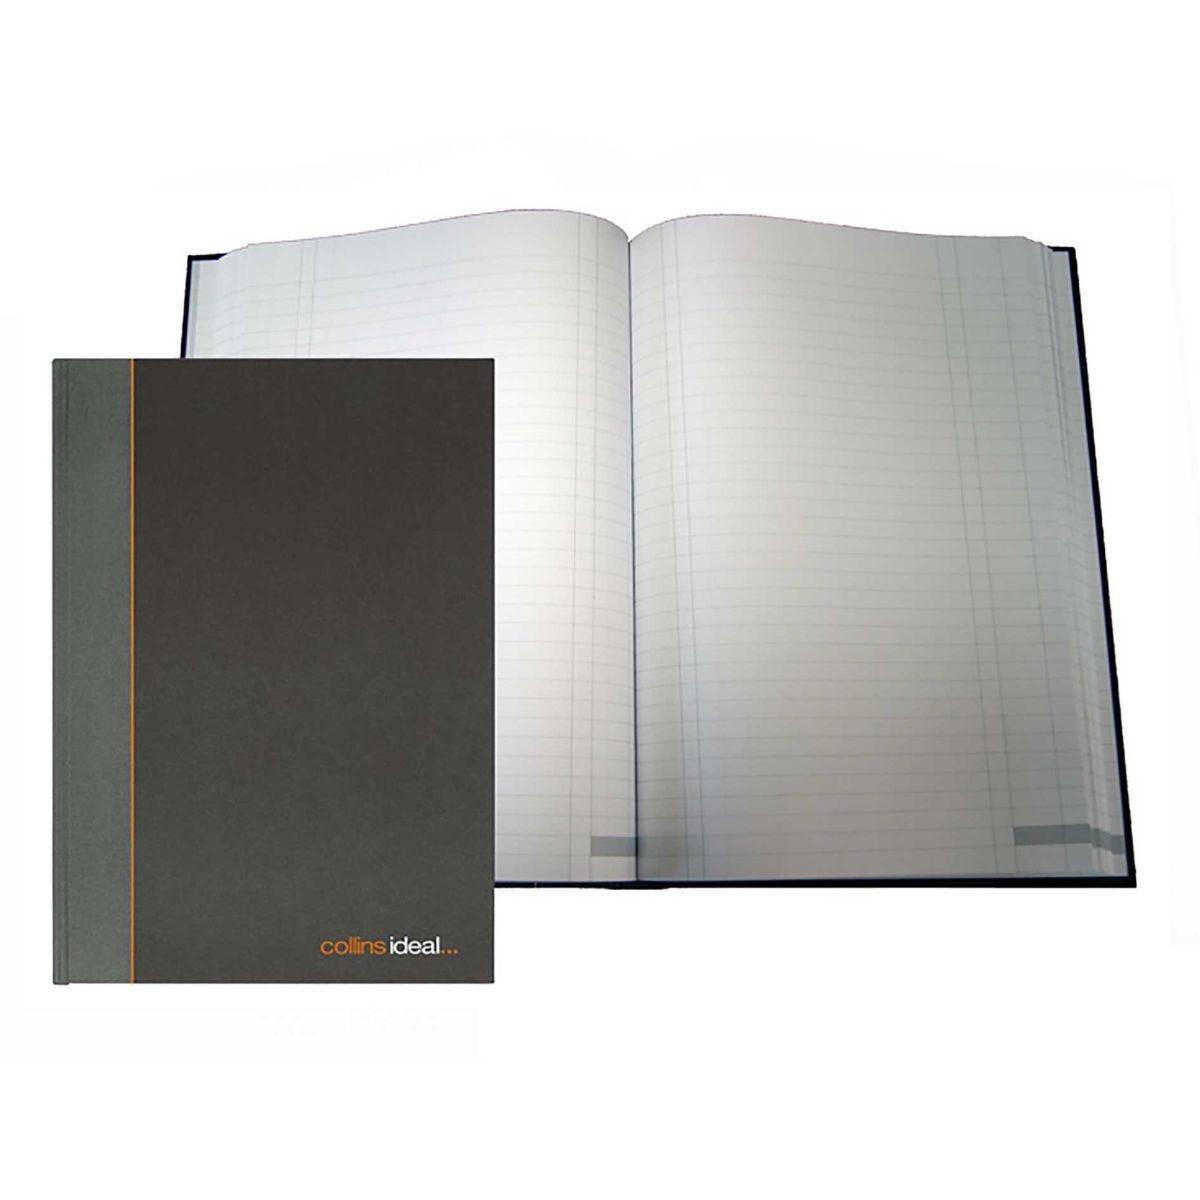 Collins Ideal Case Bound Single Cash Book A4